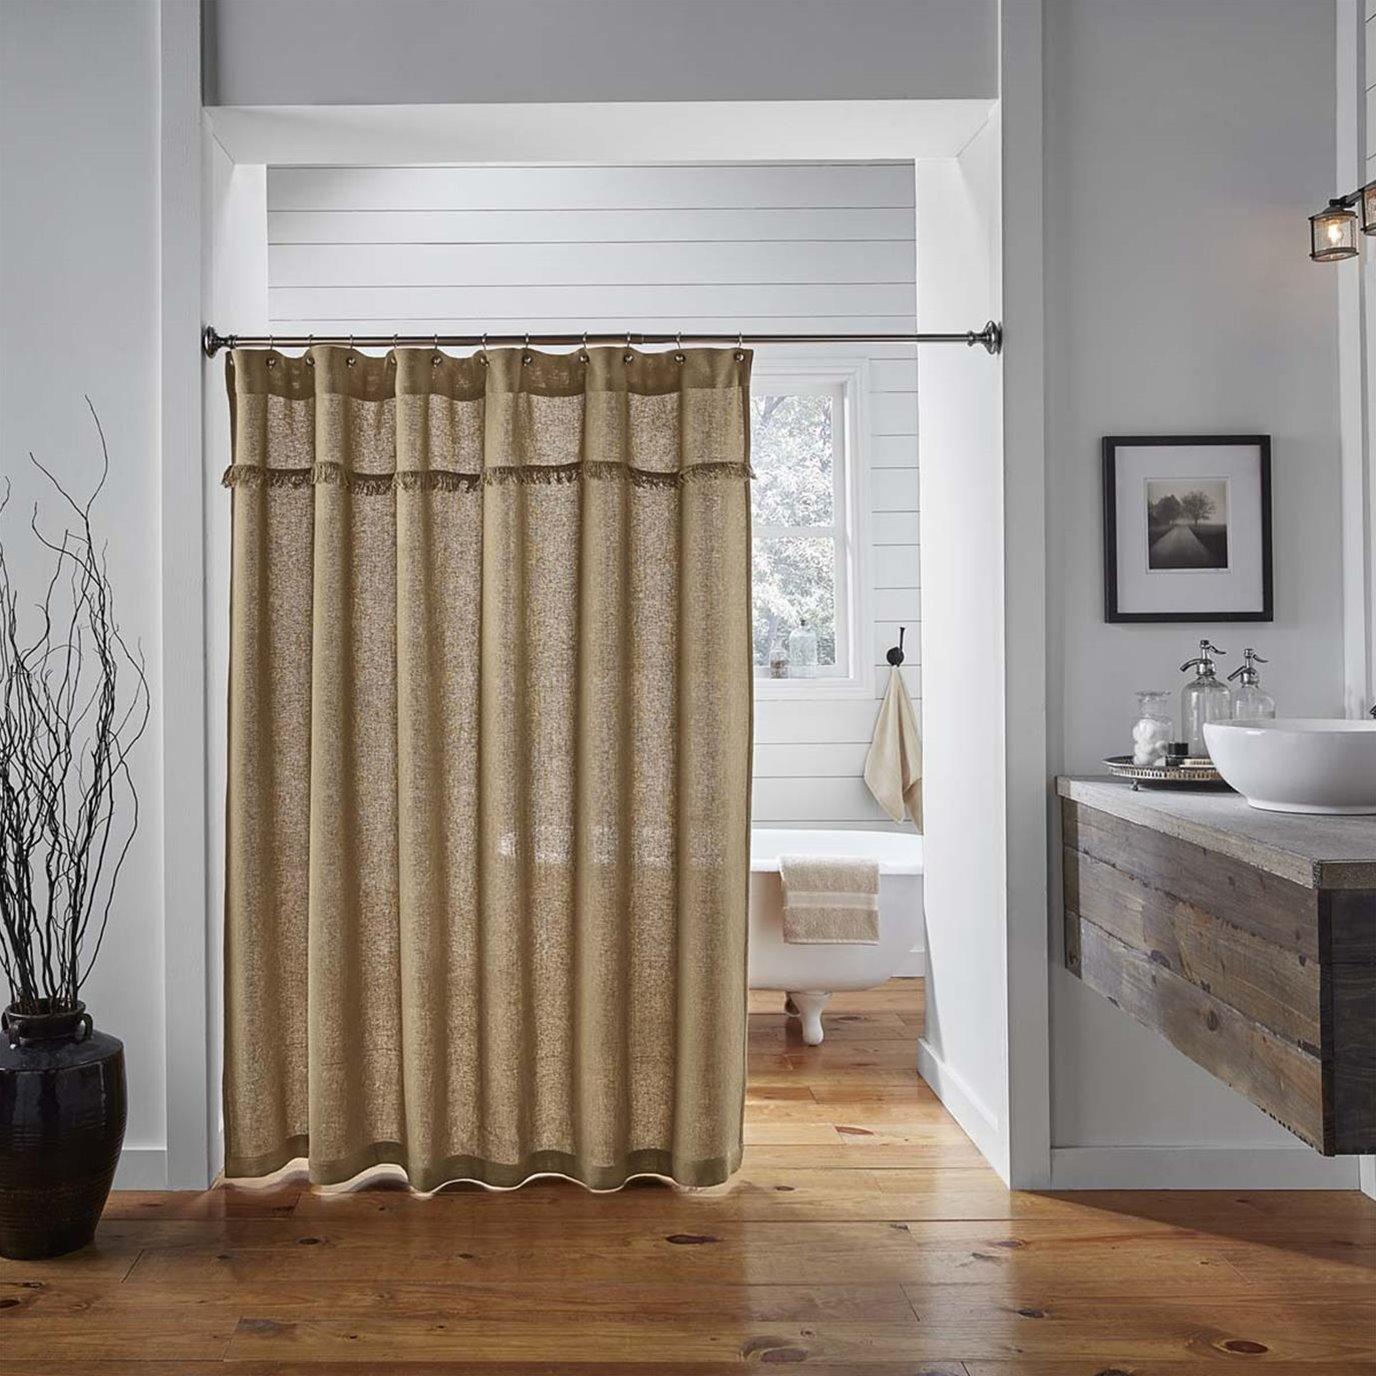 Burlap Natural Shower Curtain 72x72